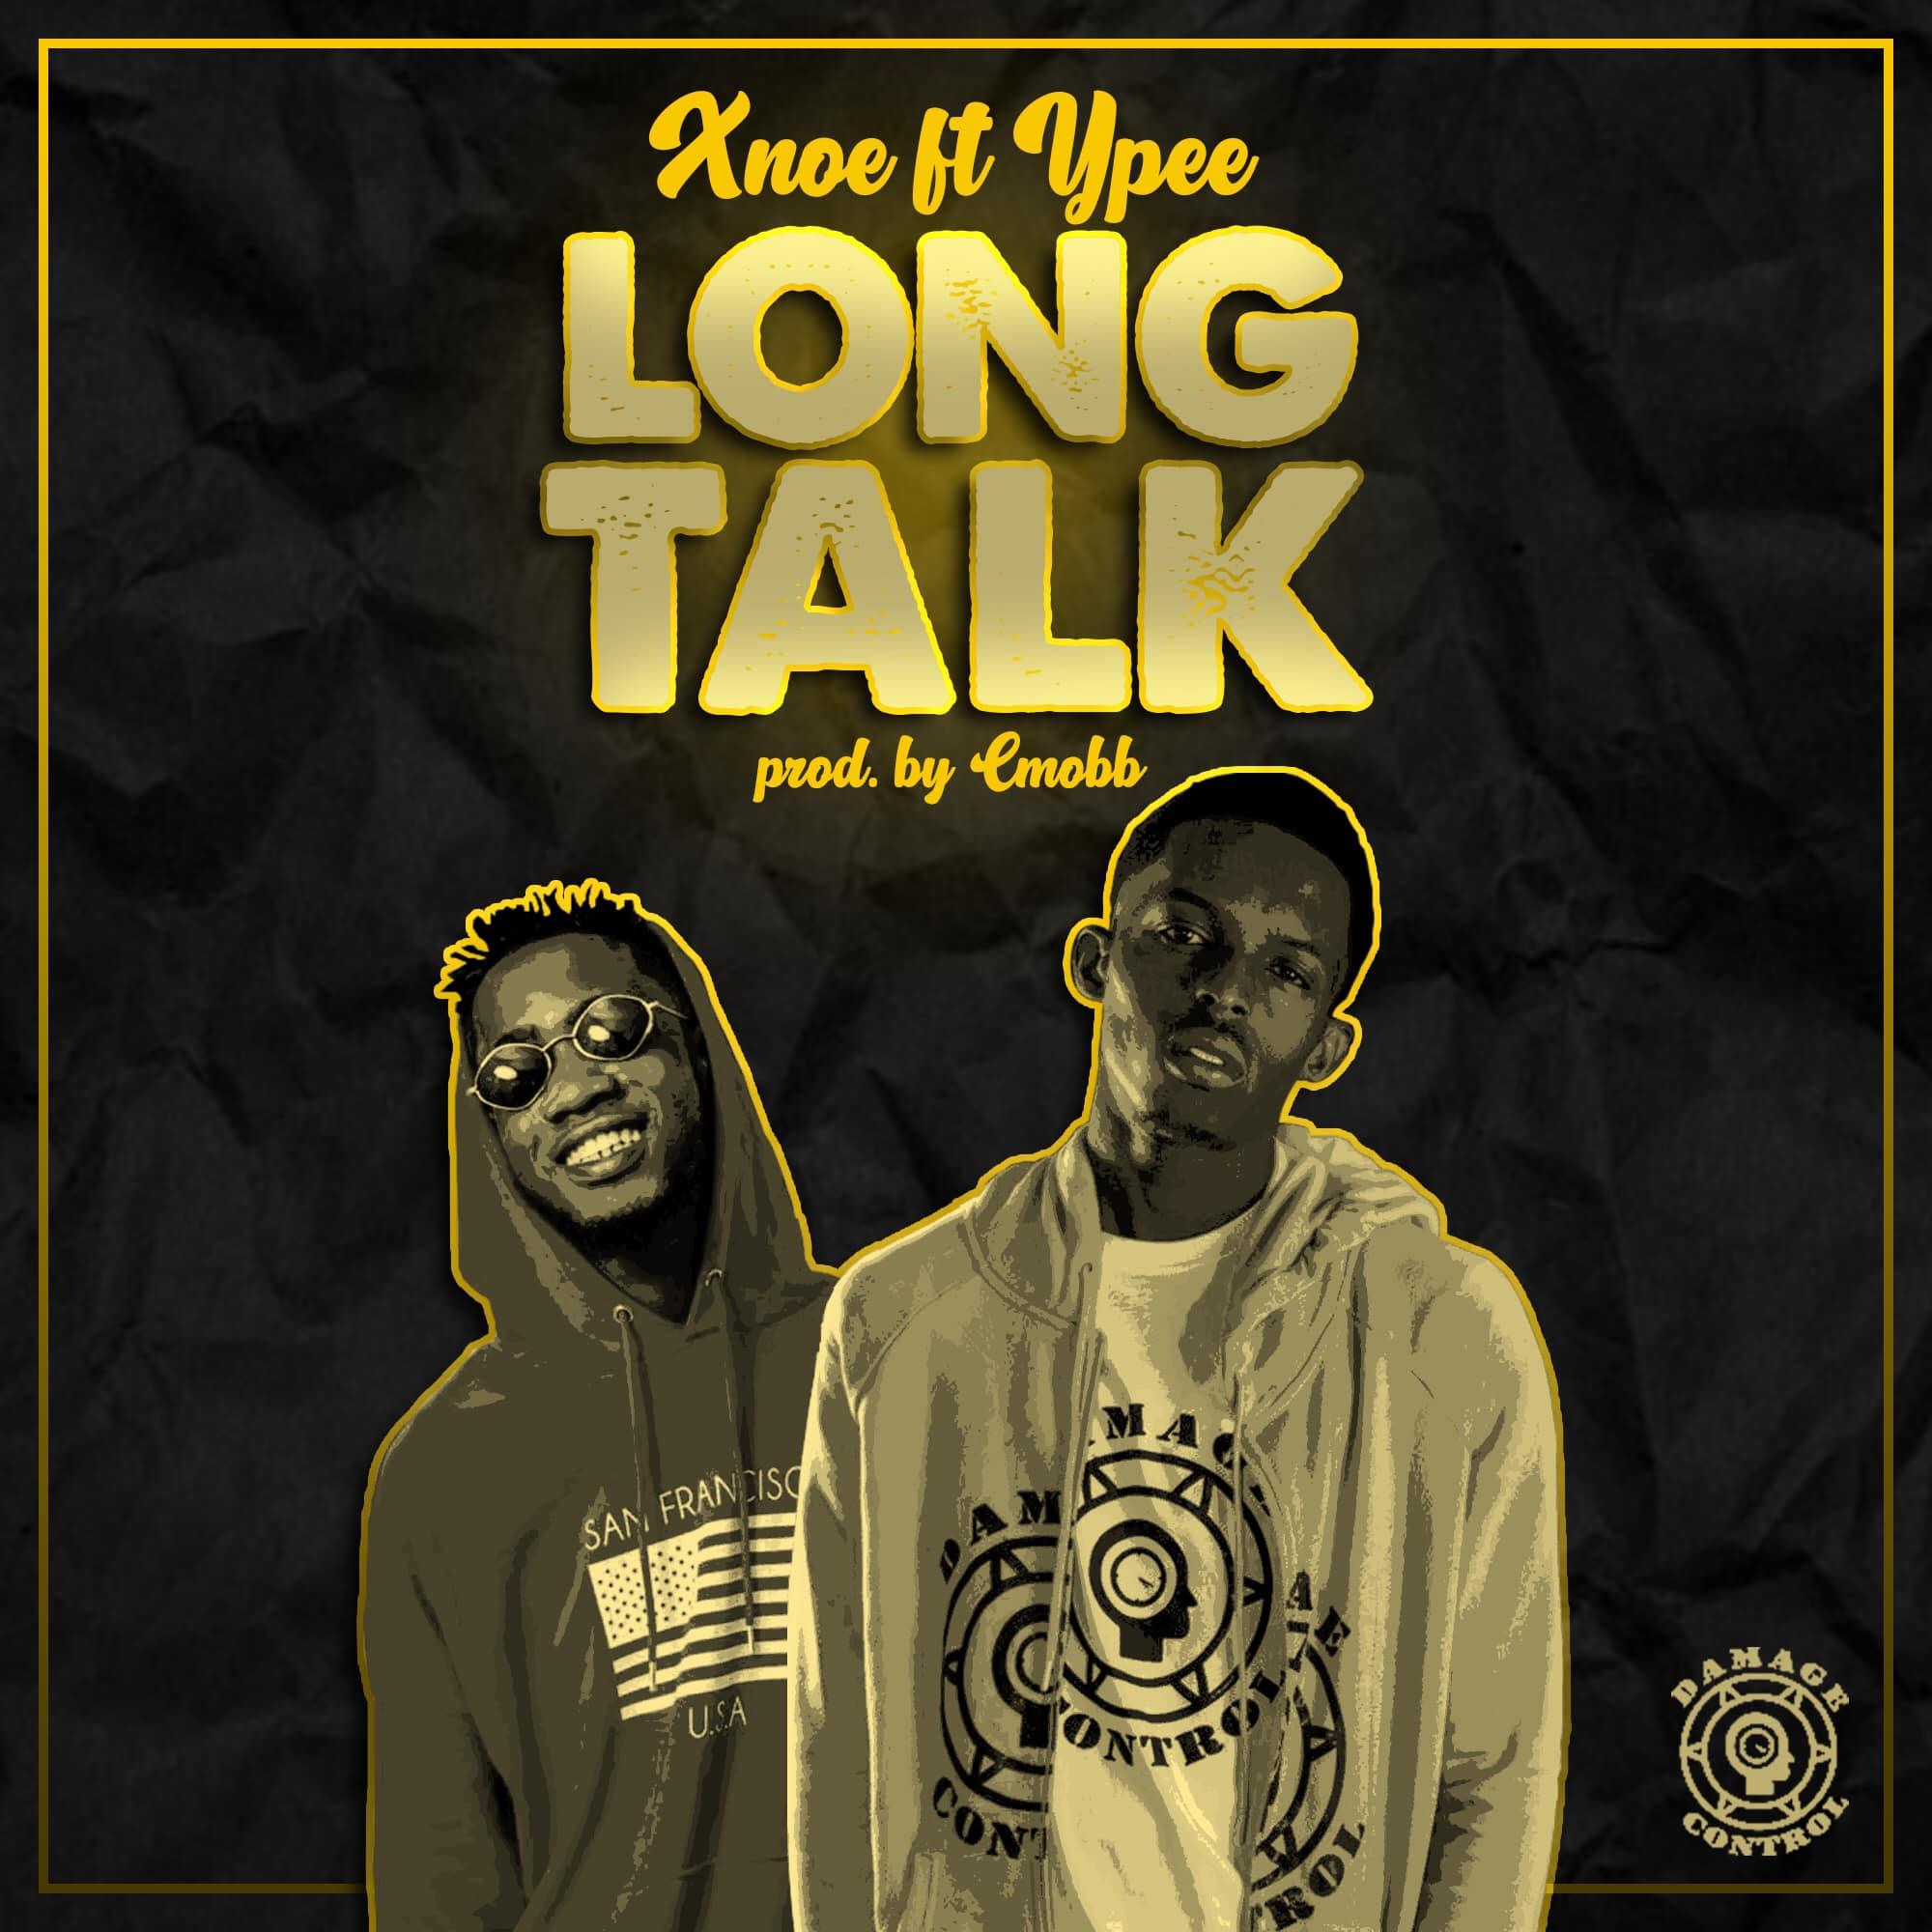 Xnoe - Long Talk Ft. Ypee (Prod By Cmobb)Xnoe - Long Talk Ft. Ypee (Prod By Cmobb)